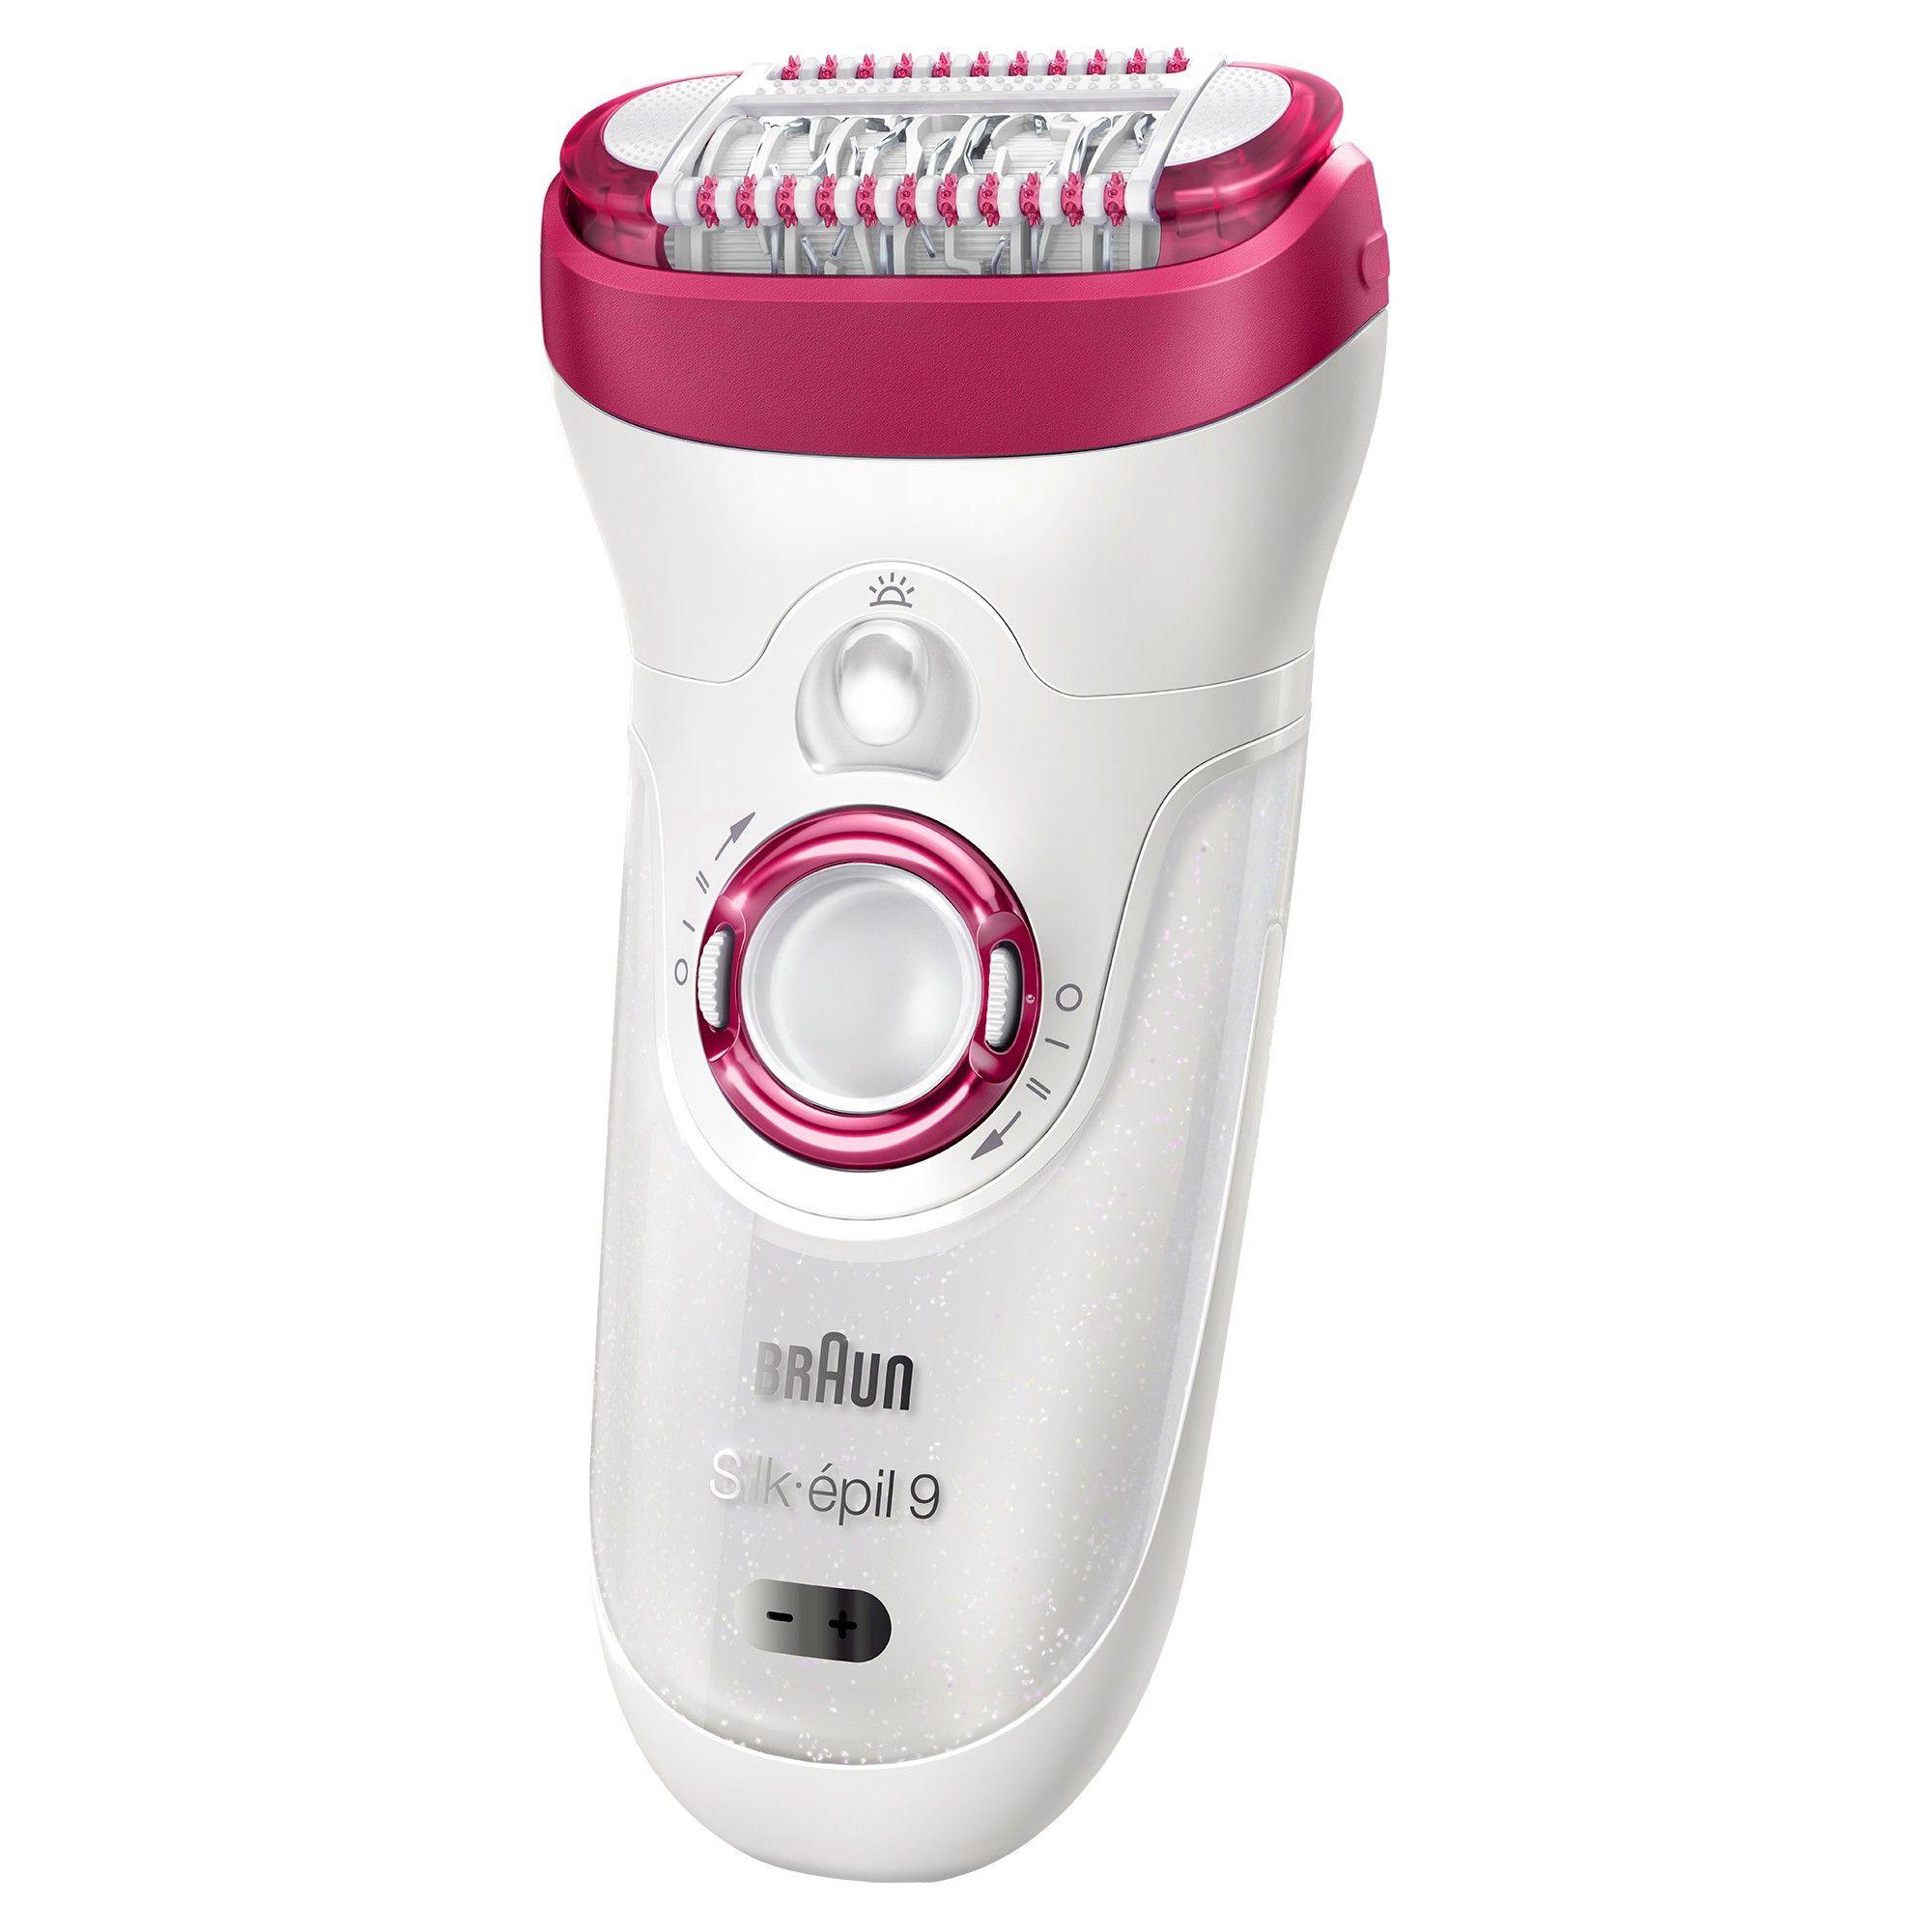 Braun Silk-epil 9 Wet   Dry Women s Rechargeable Electric Epilator - SE9521 95ad59724